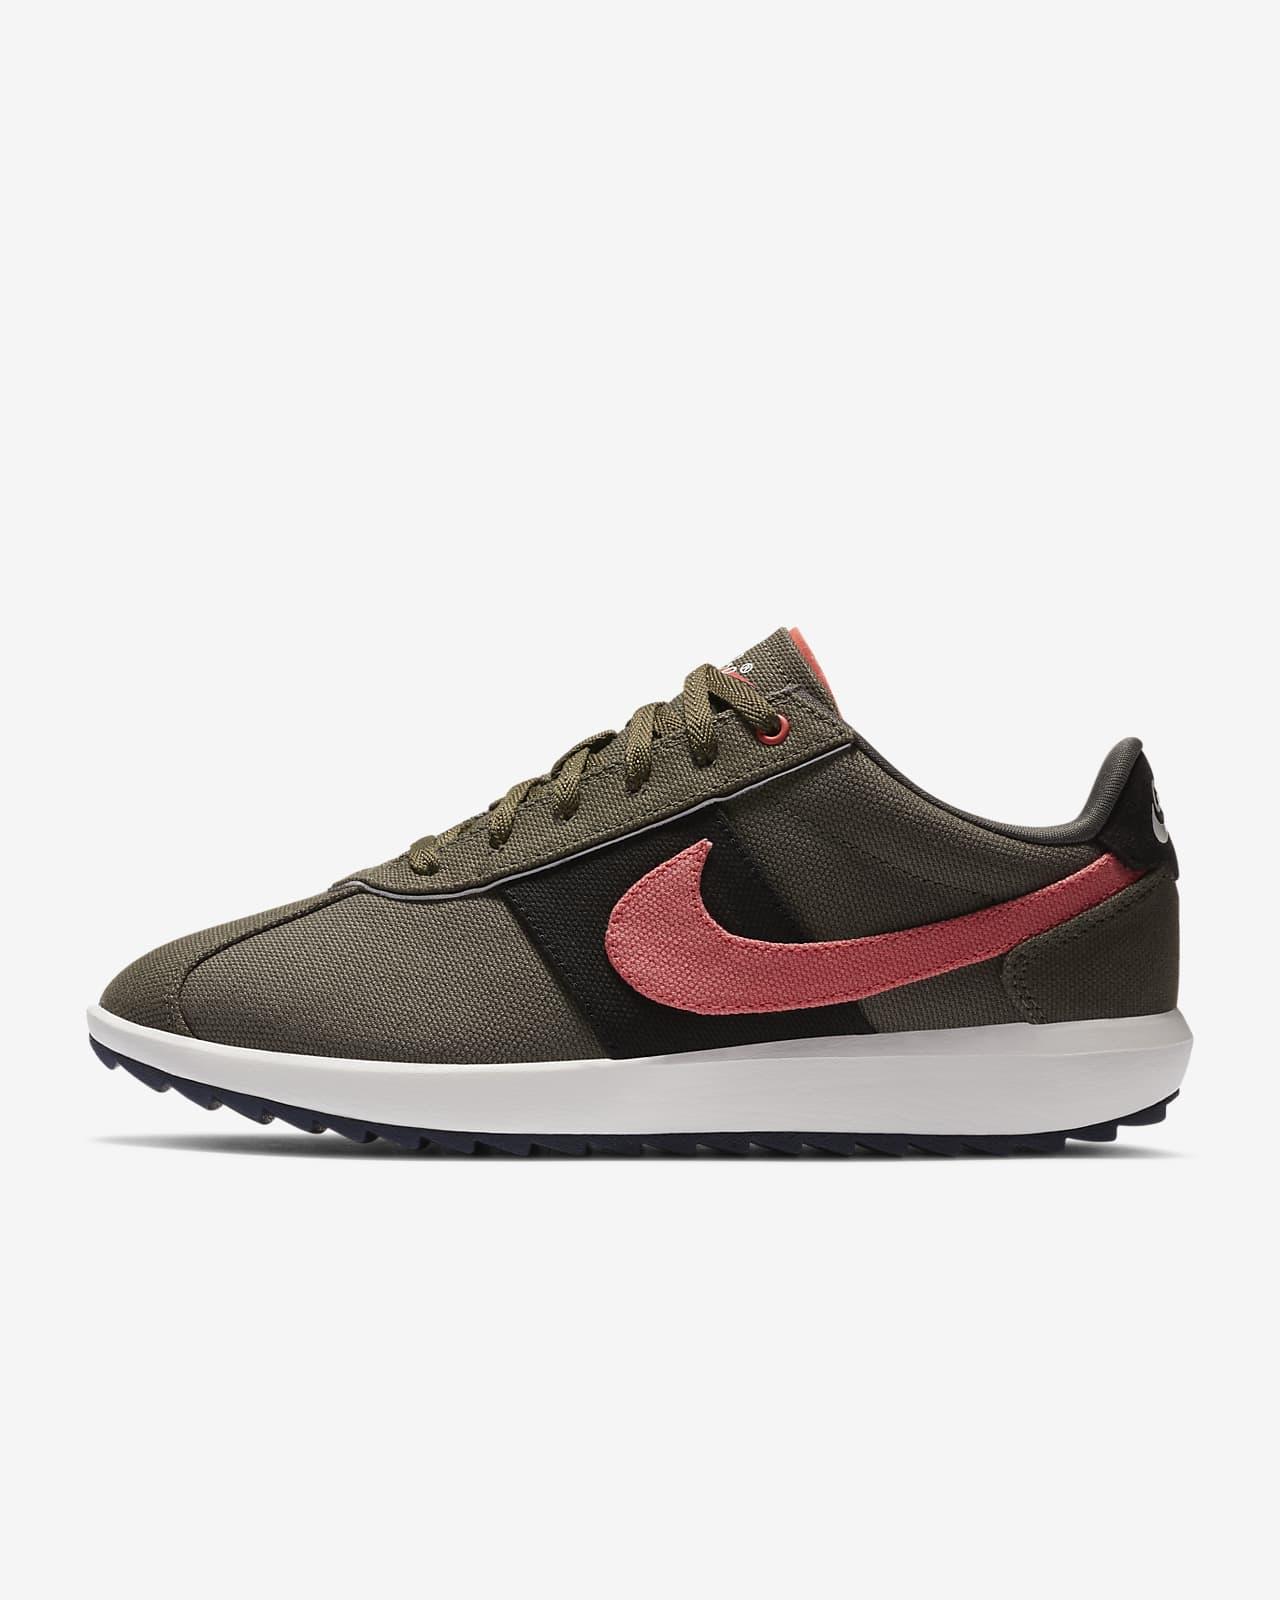 Nike Cortez G NRG Sabatilles de golf - Dona